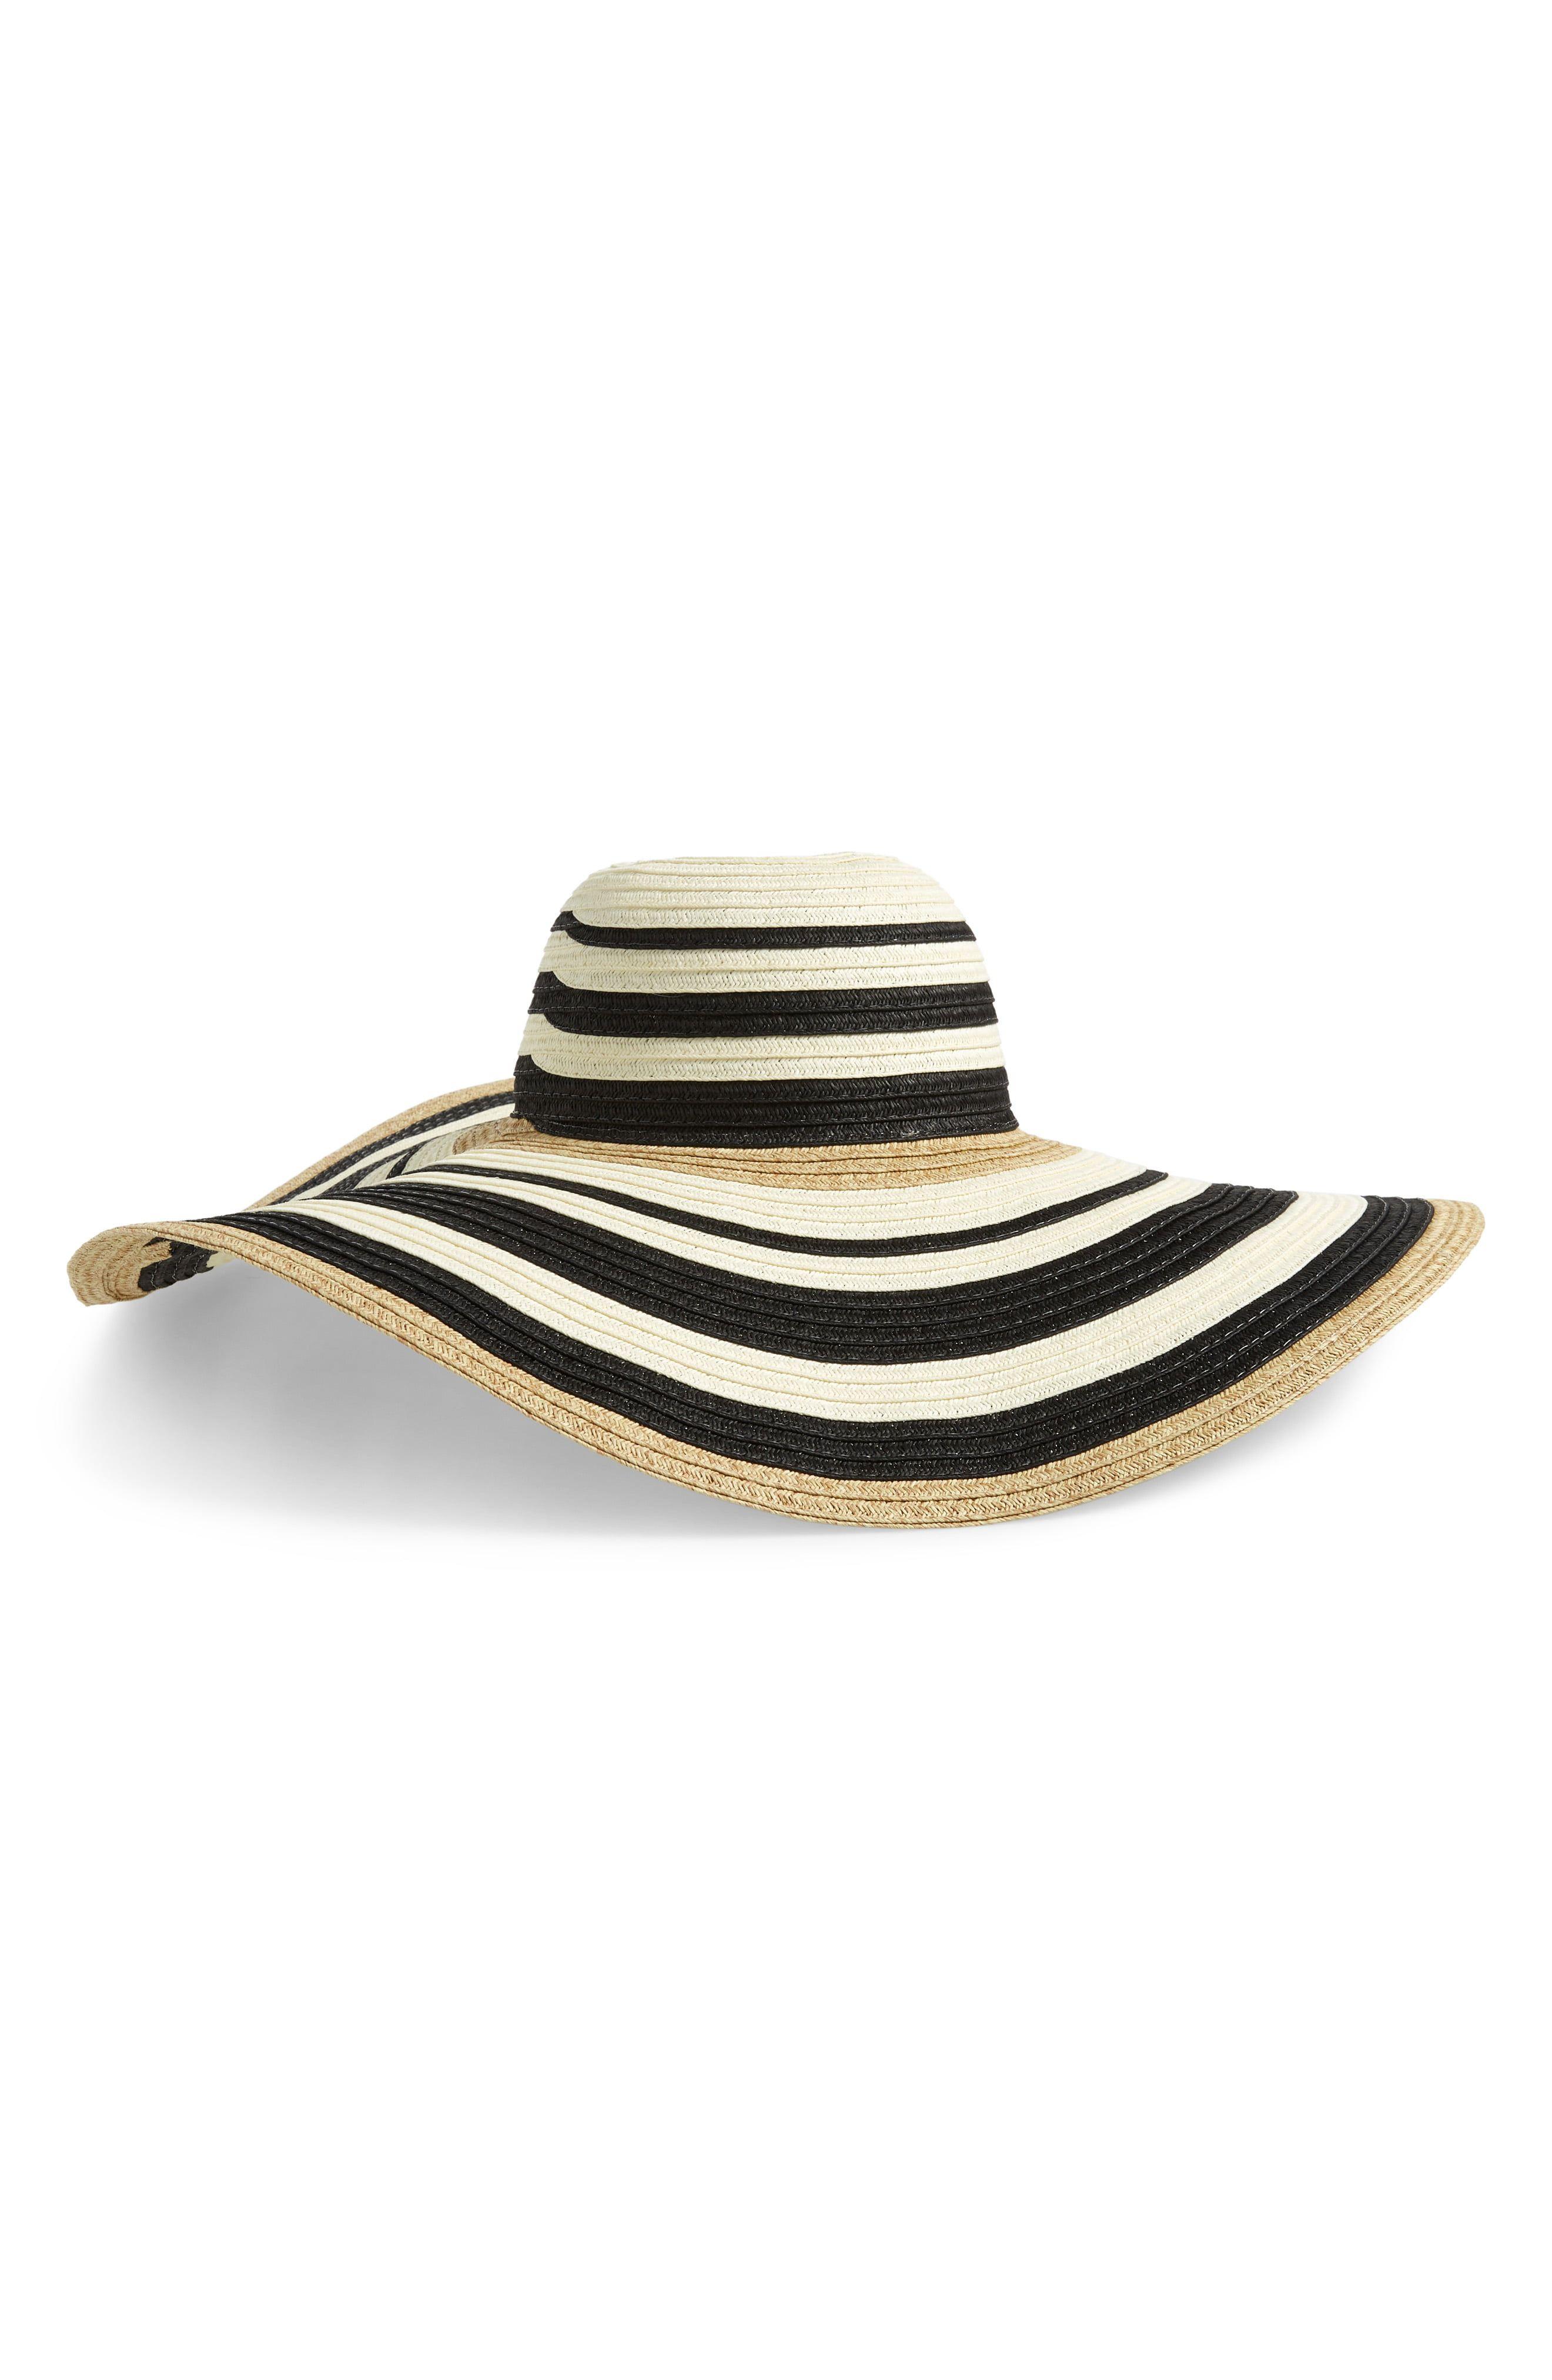 28c41efa 7 Best Summer Hats - Stylish Sunhats